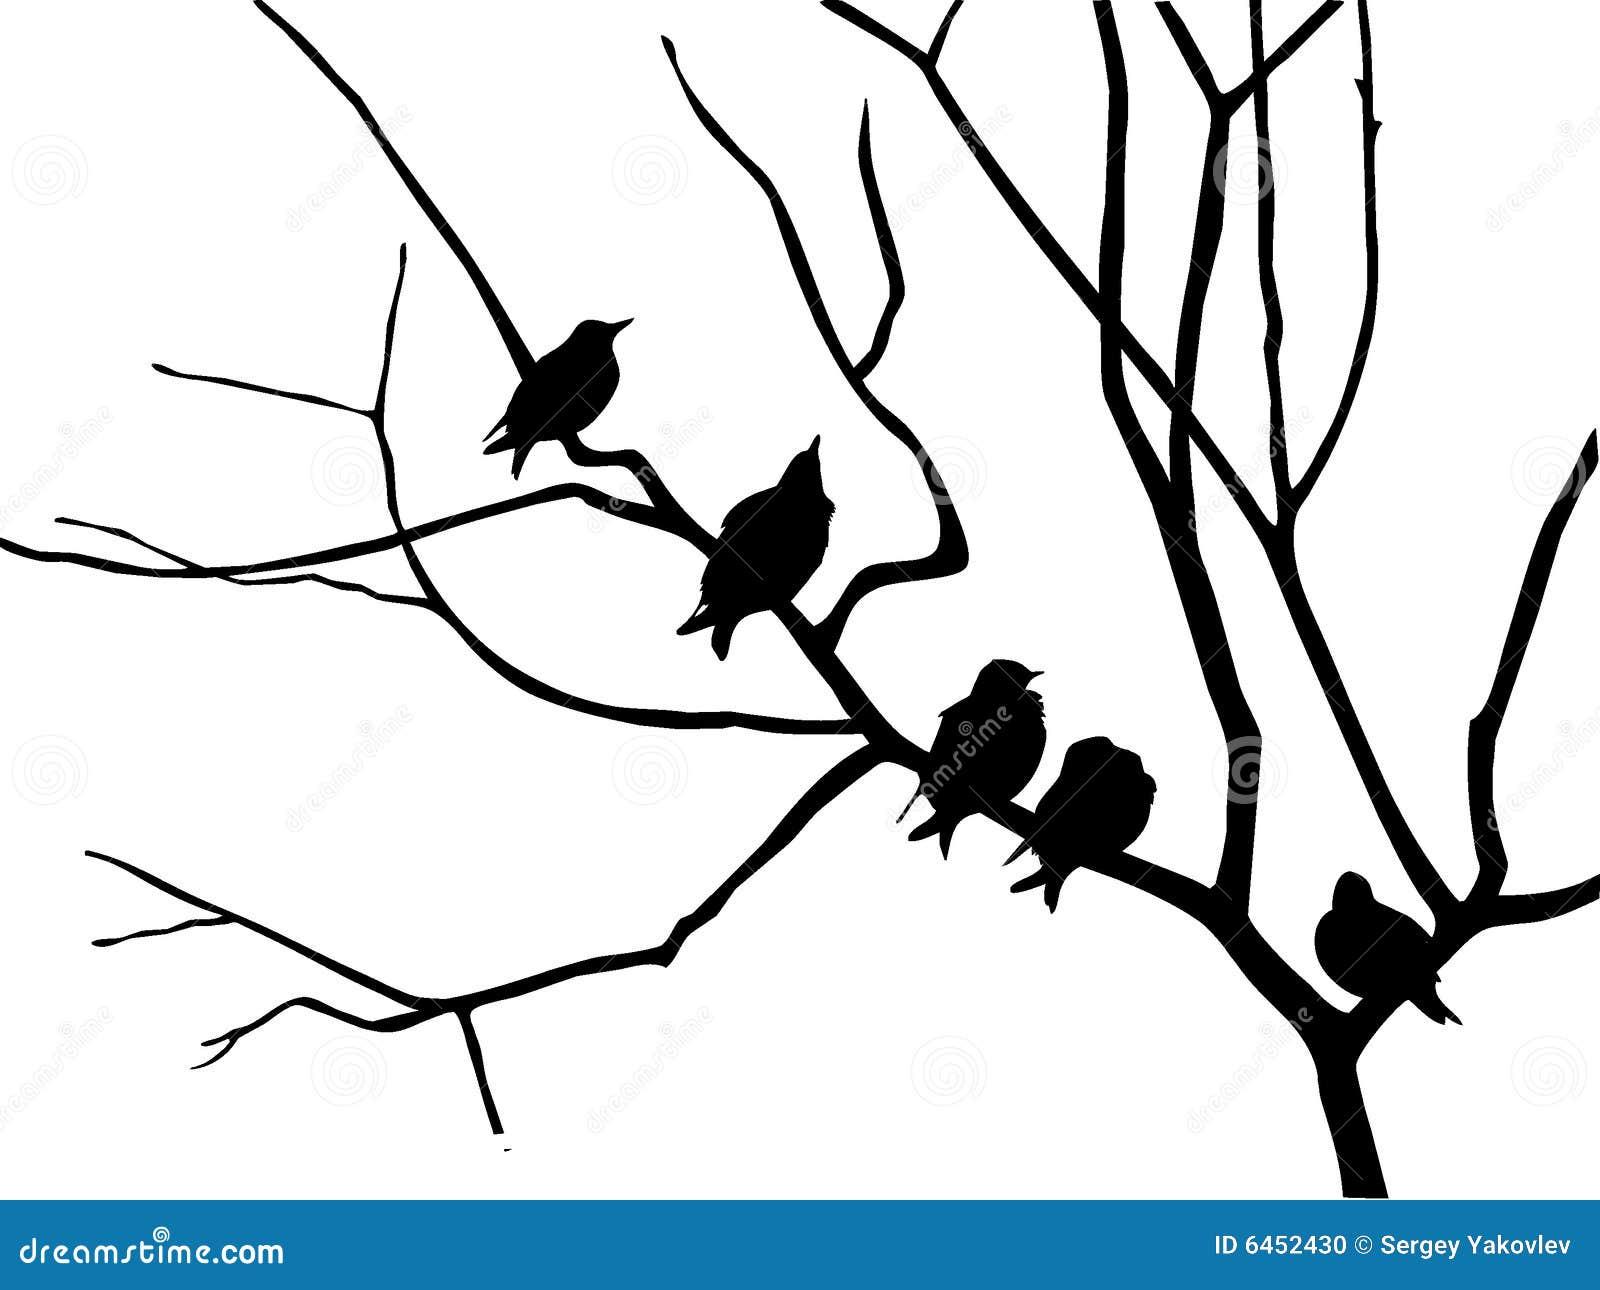 Starling sylwetka